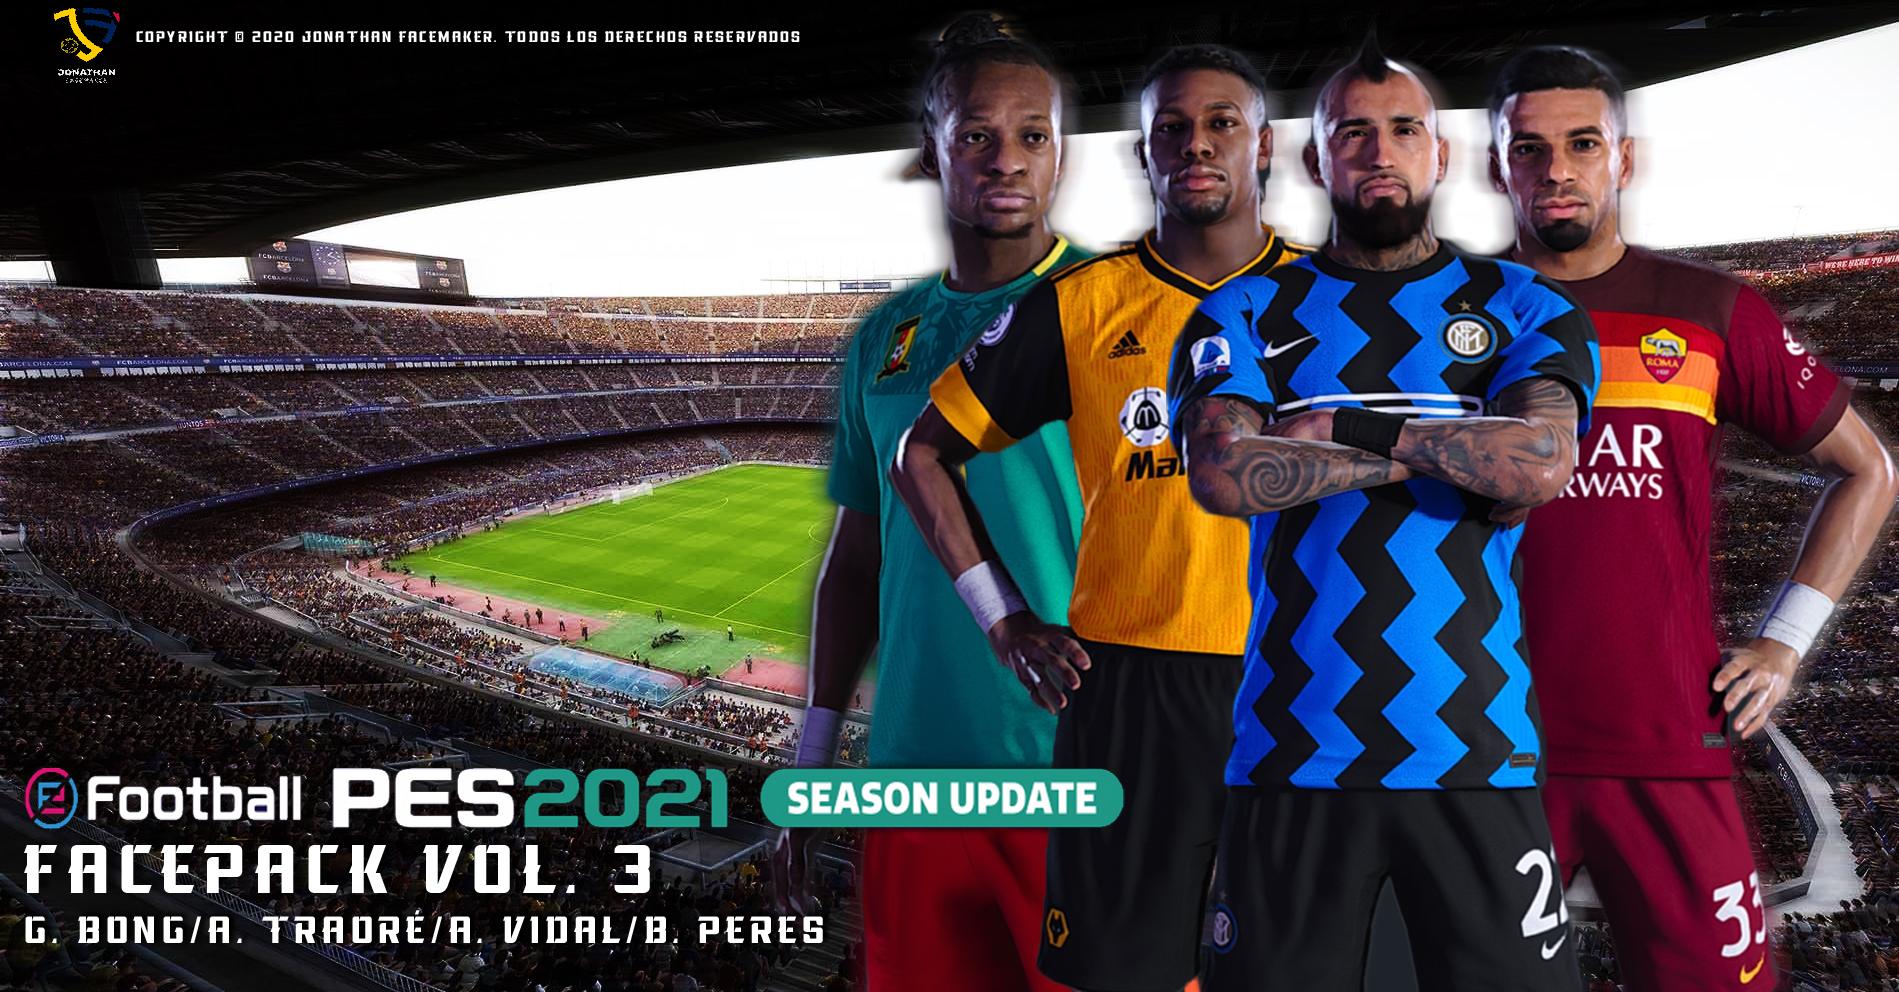 PES 2021 Facepack Vol. 3 by Jonathan